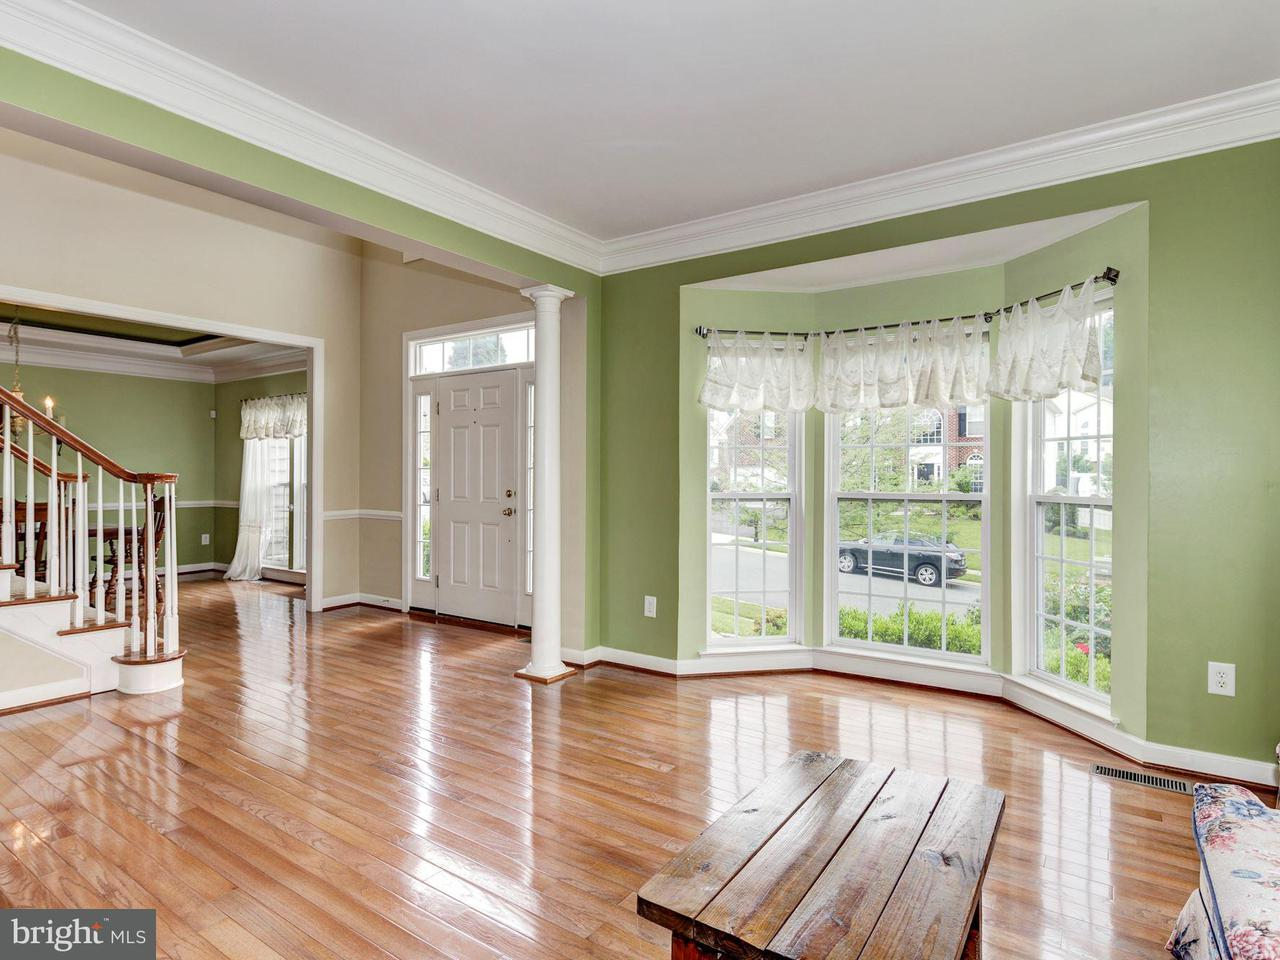 独户住宅 为 销售 在 3703 PERRY HALL Road 3703 PERRY HALL Road Perry Hall, 马里兰州 21128 美国